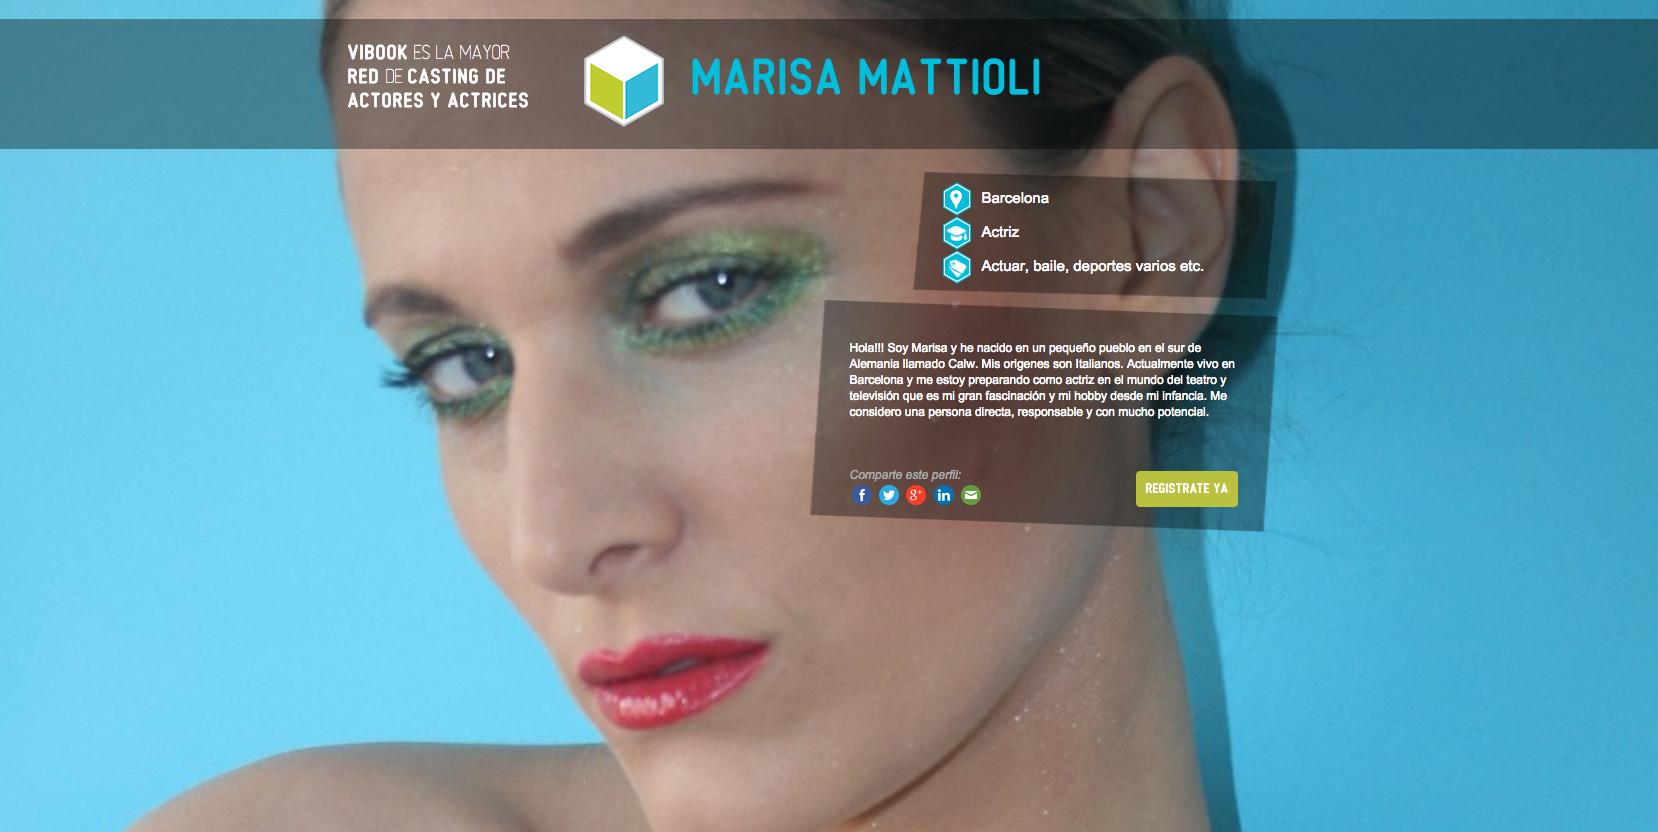 Actriz MARISA MATTIOLI